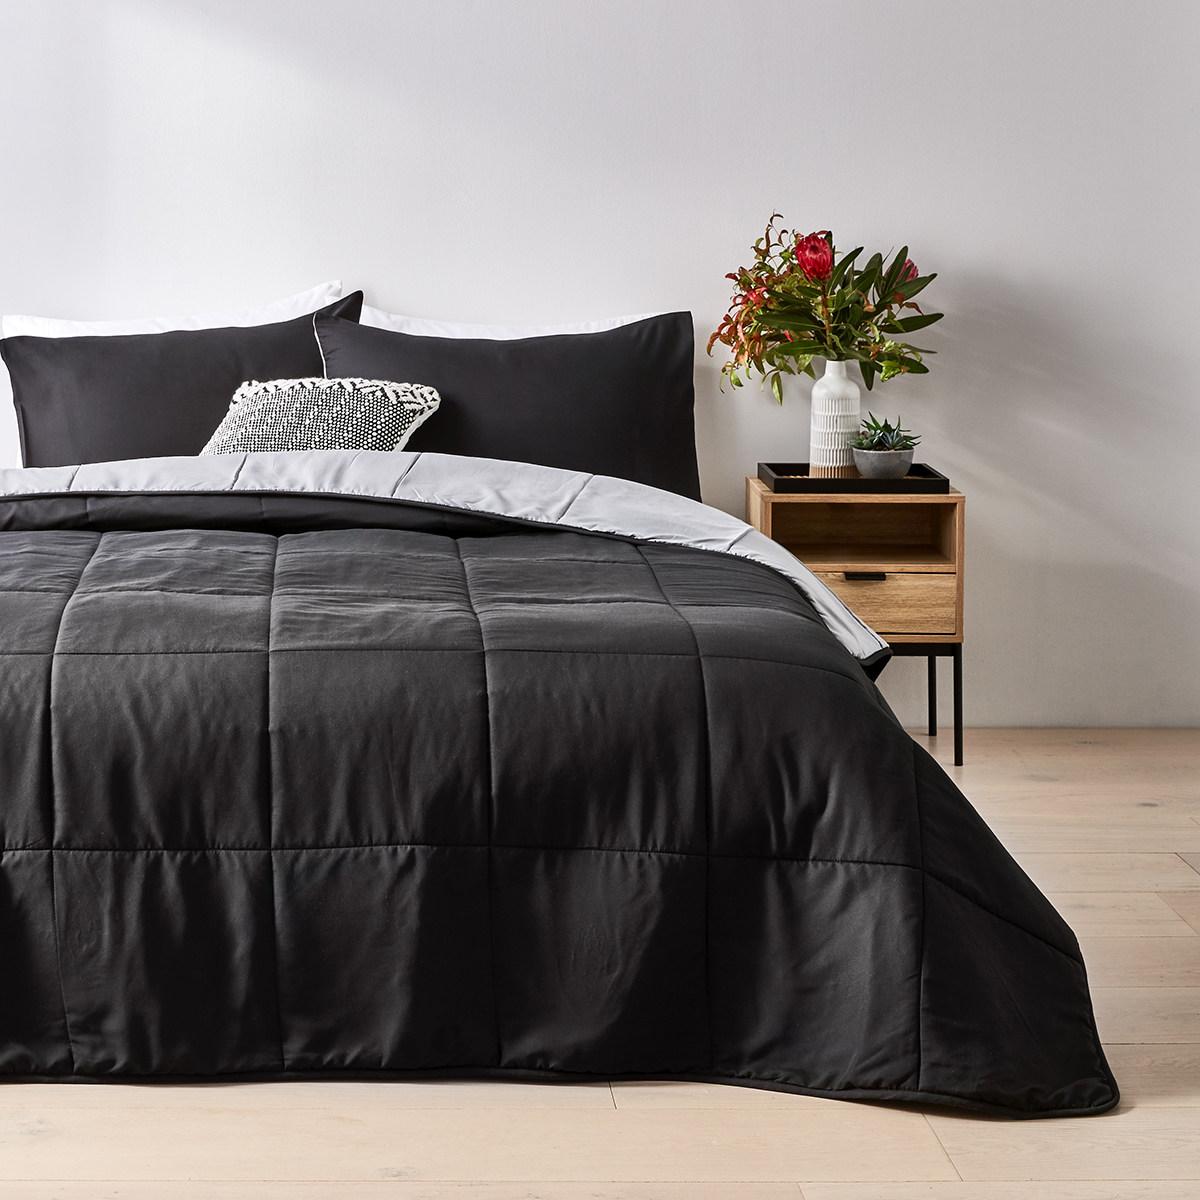 Quilt Cover Sets & Bedding Sets   Kmart : bed quilt cover sets - Adamdwight.com